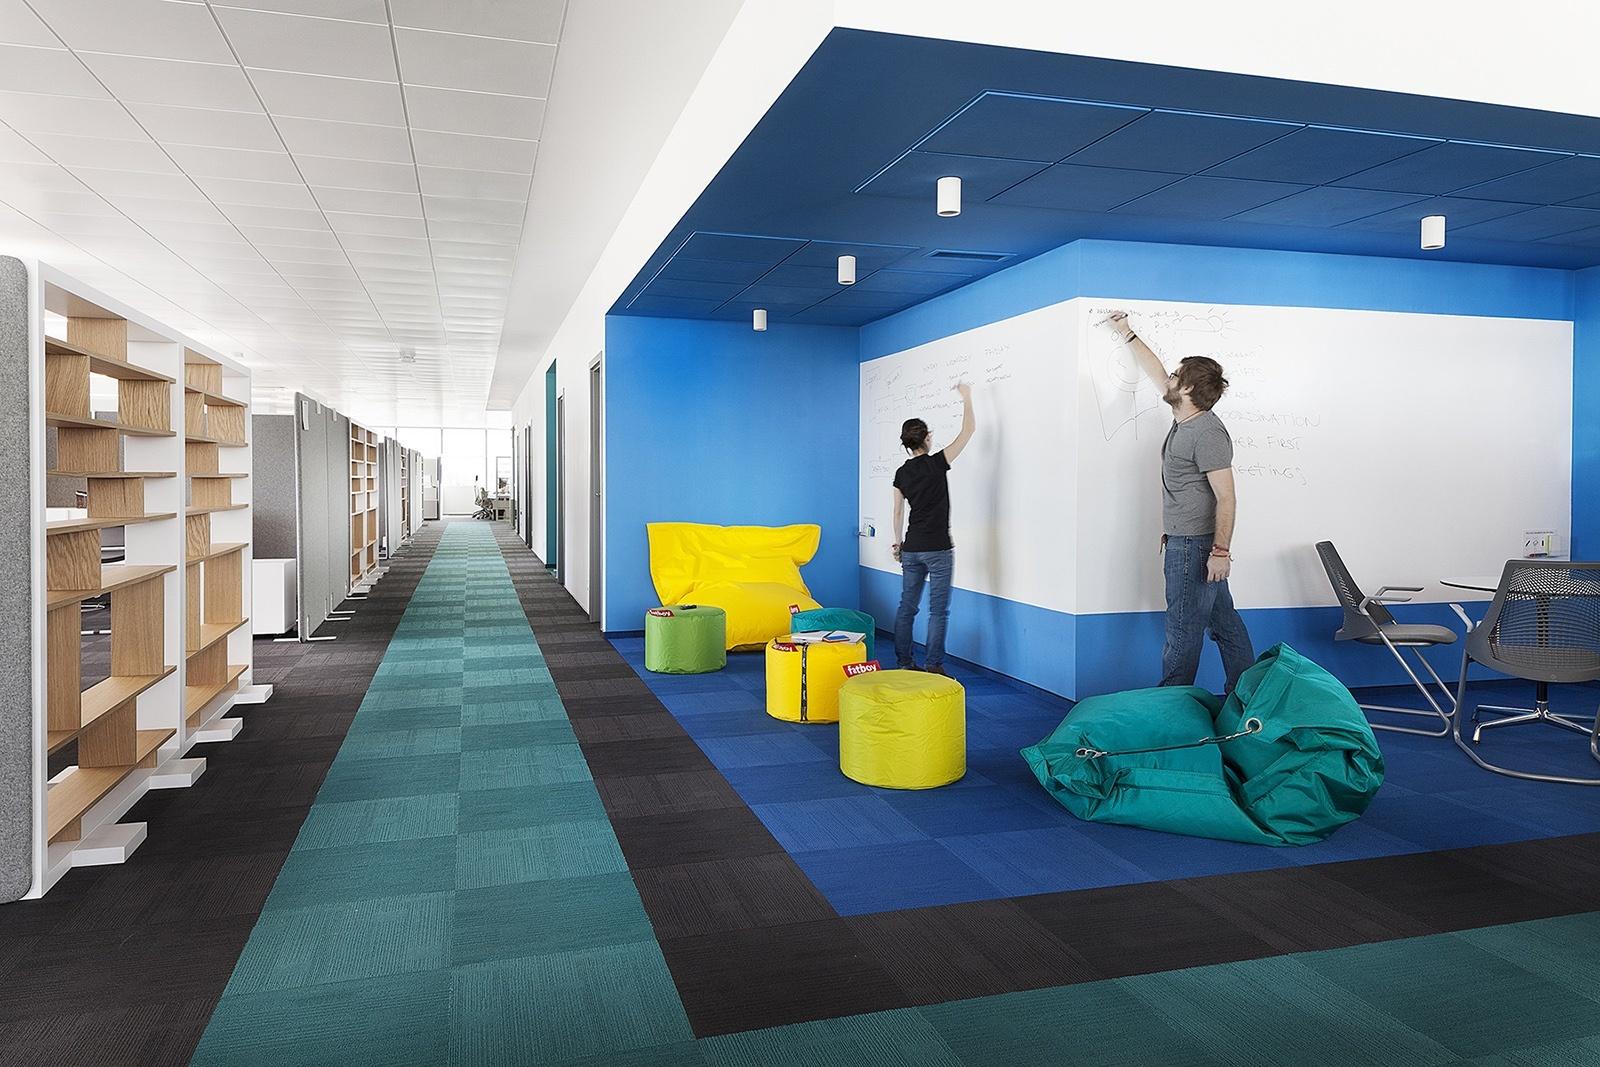 Paysafe-office-developers-cache atelier-Sofia-Bulgaria-17-brainstorm corrner